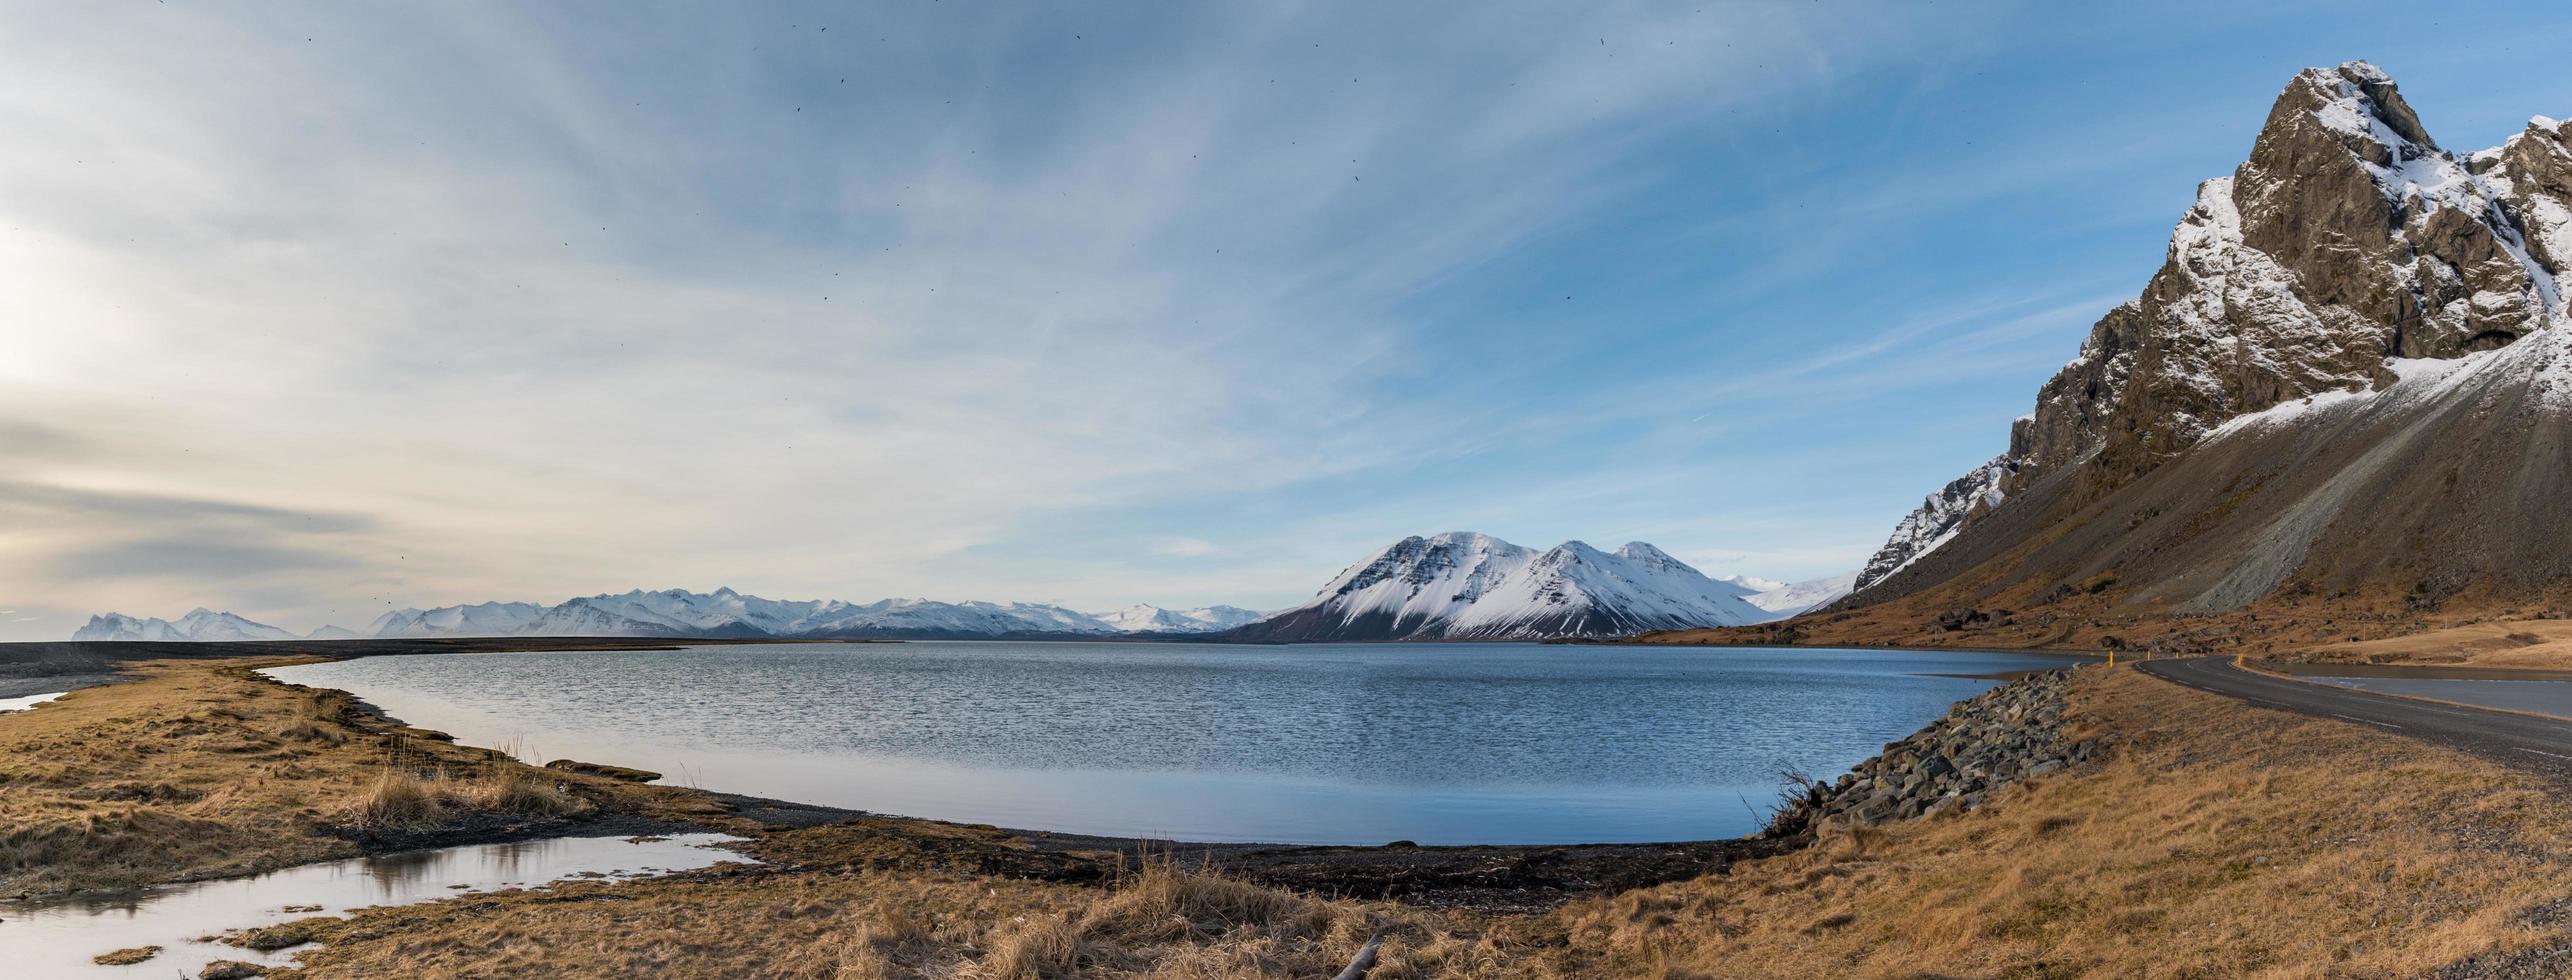 Iceland landscape view of the Djupivogur Island photo